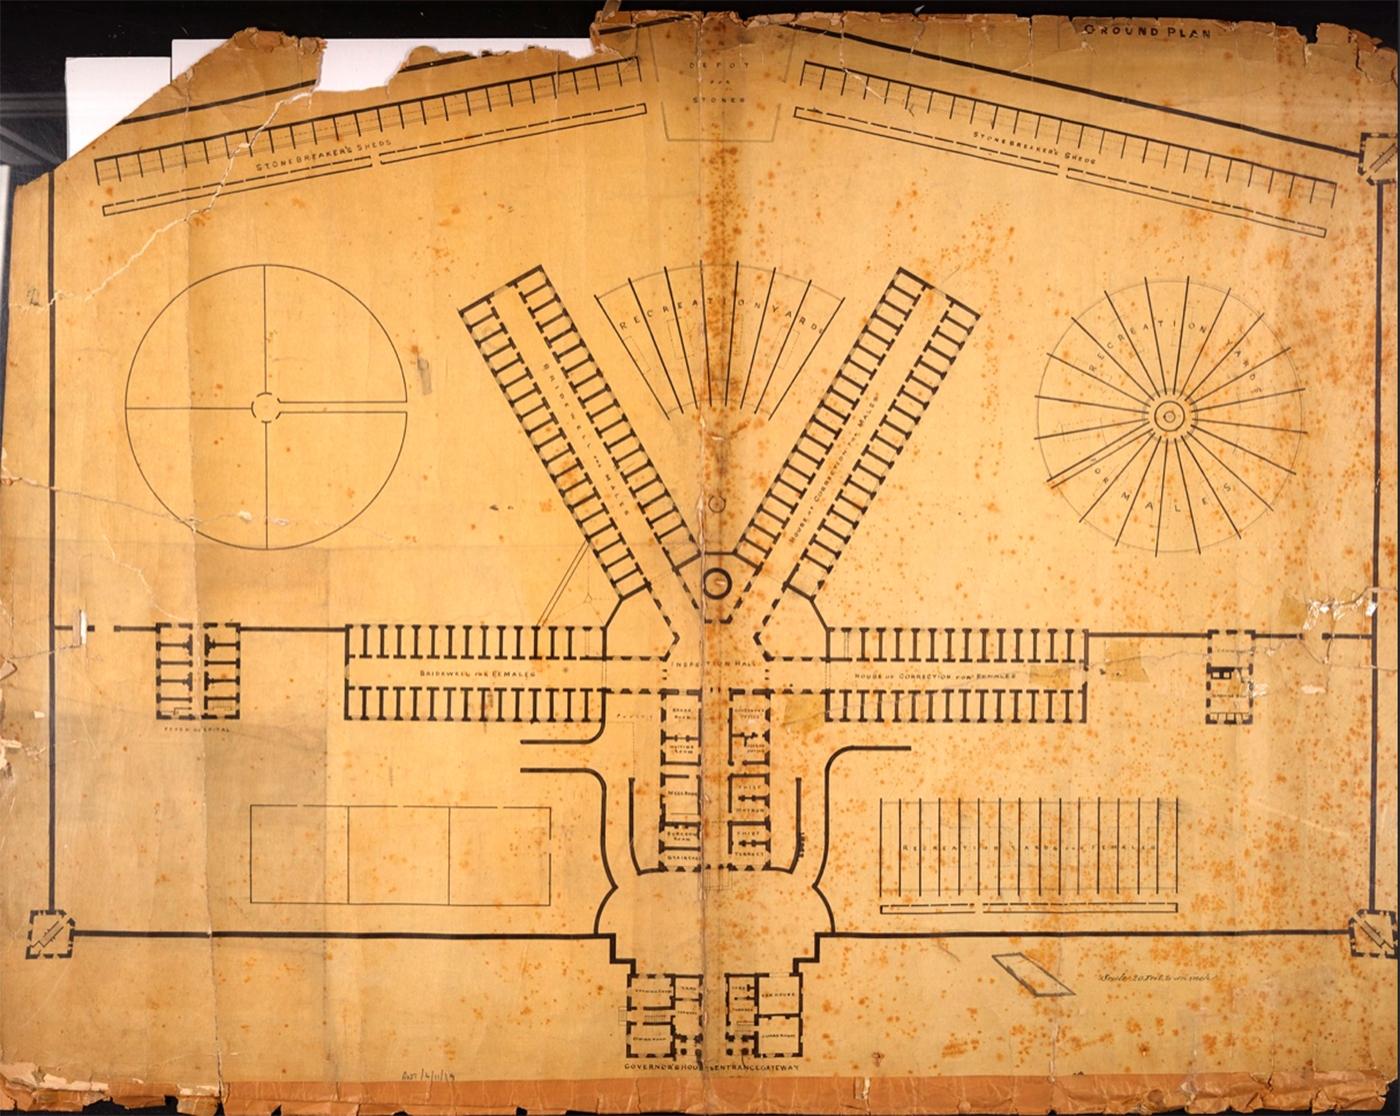 Crumlin Road Prison/Belfast Gaol original plan (1842)